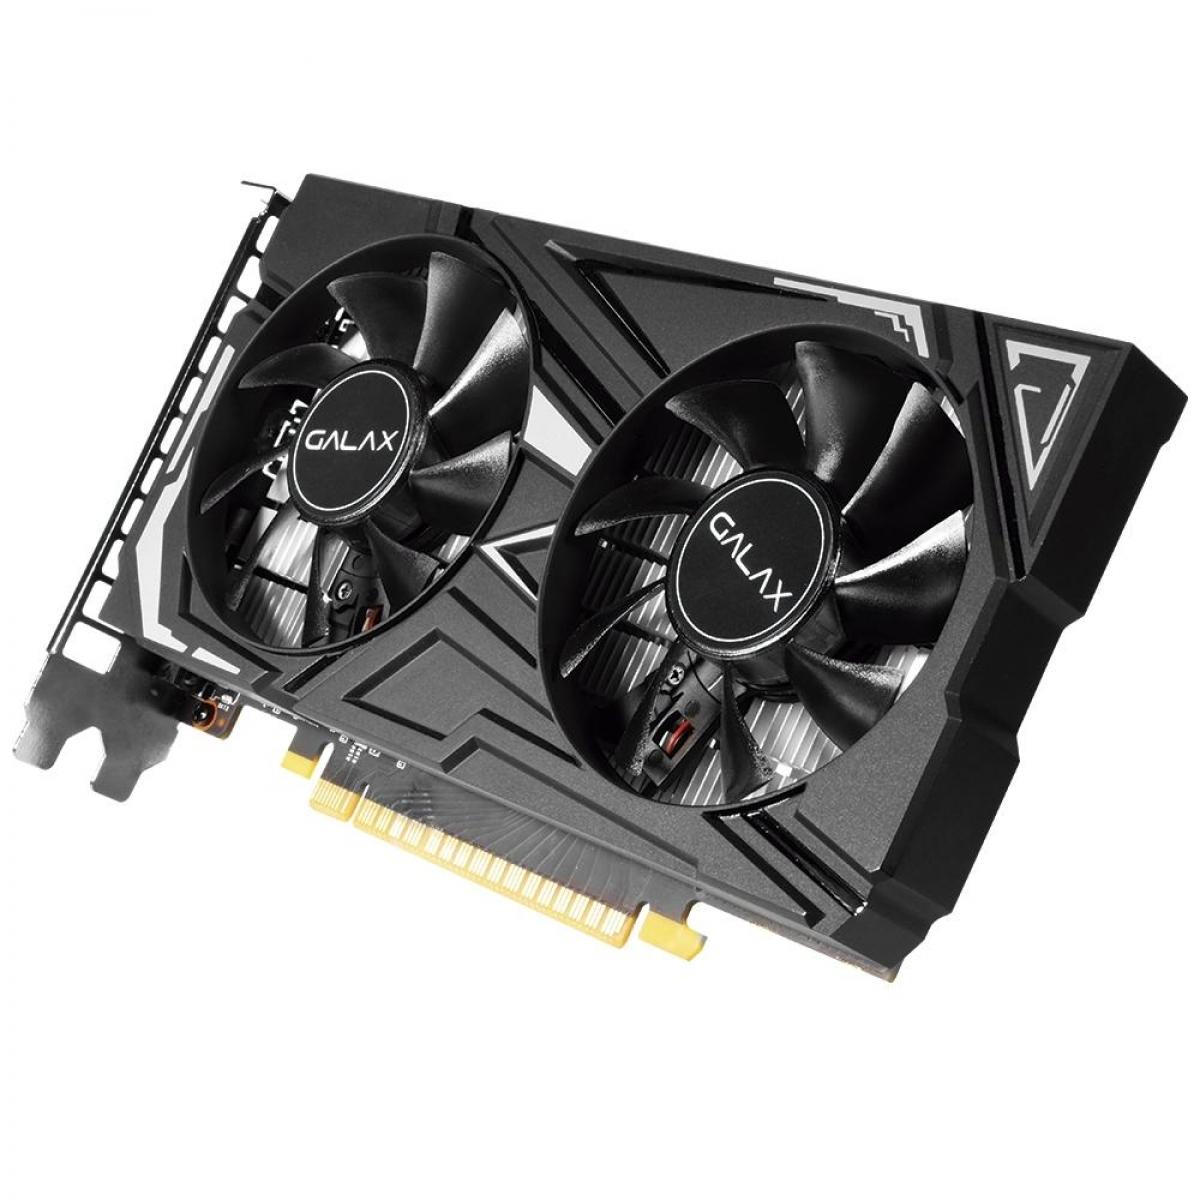 Placa de Video Galax, GeForce, GTX 1650, 1 Click OC, Dual, 4GB, GDDR5, 128Bit, 65SQH8DS08EX